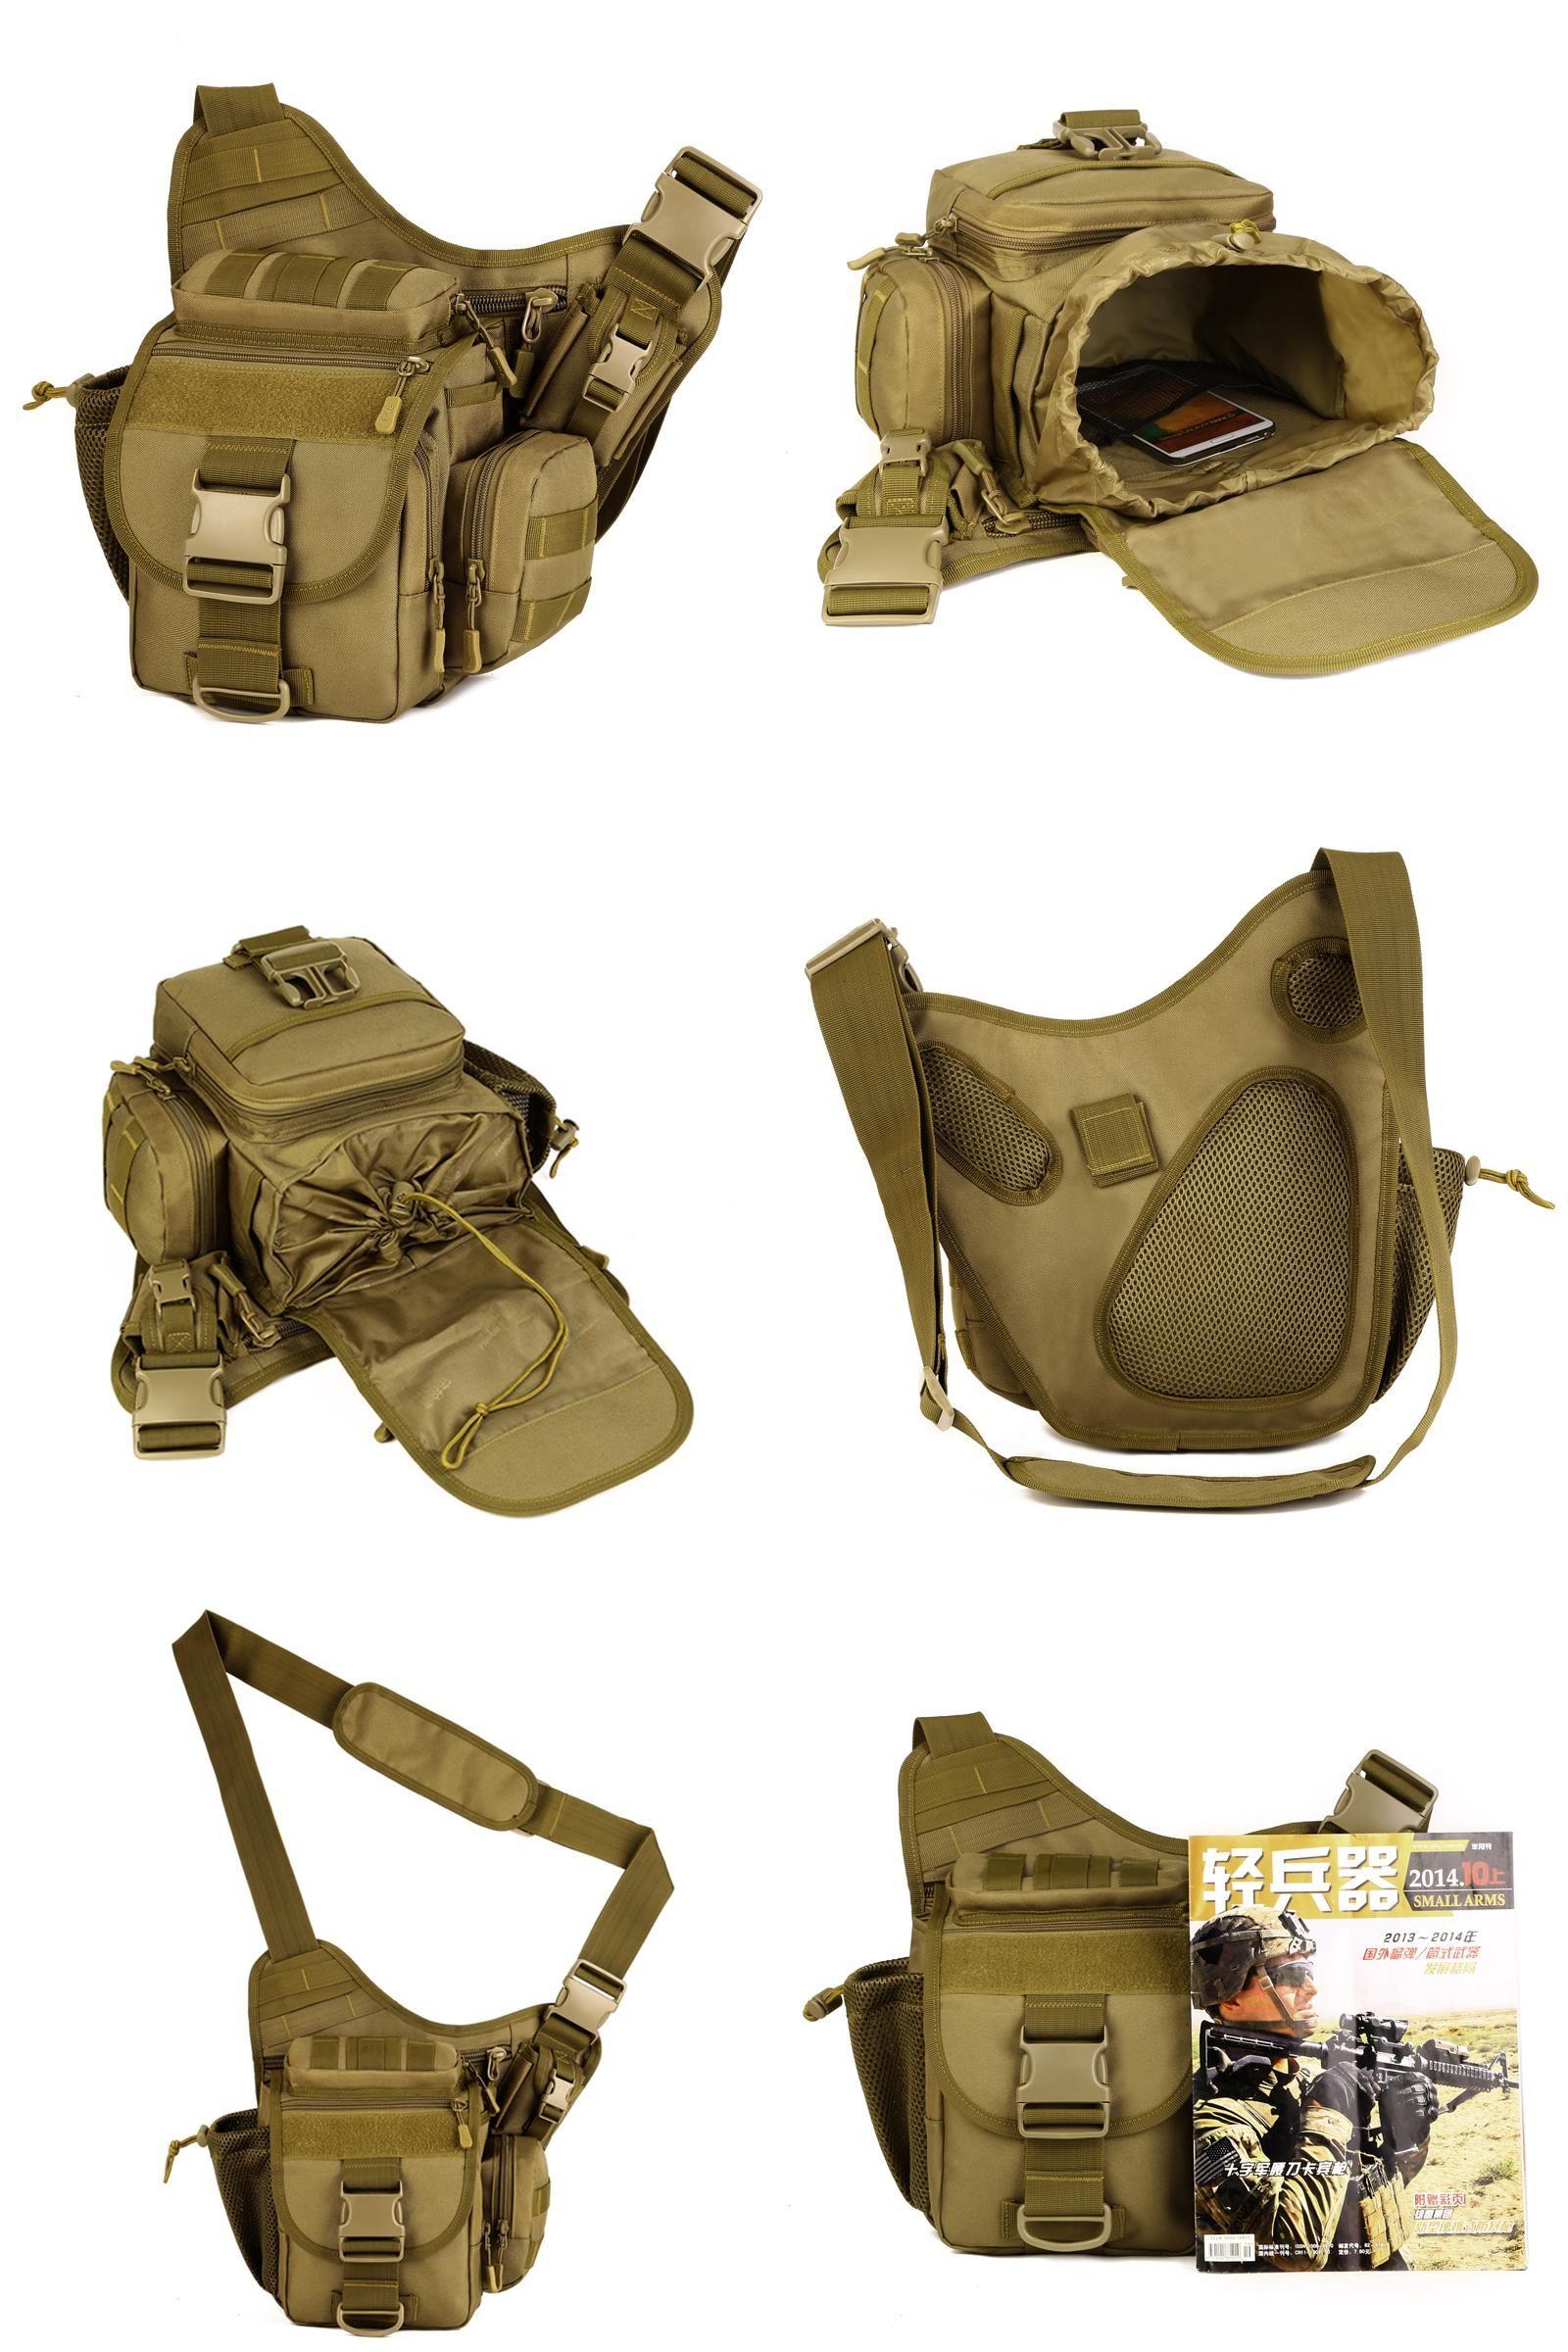 Visit to Buy] Multi-purpose Saddle Bag SLR camera bag Camo Nylon ...